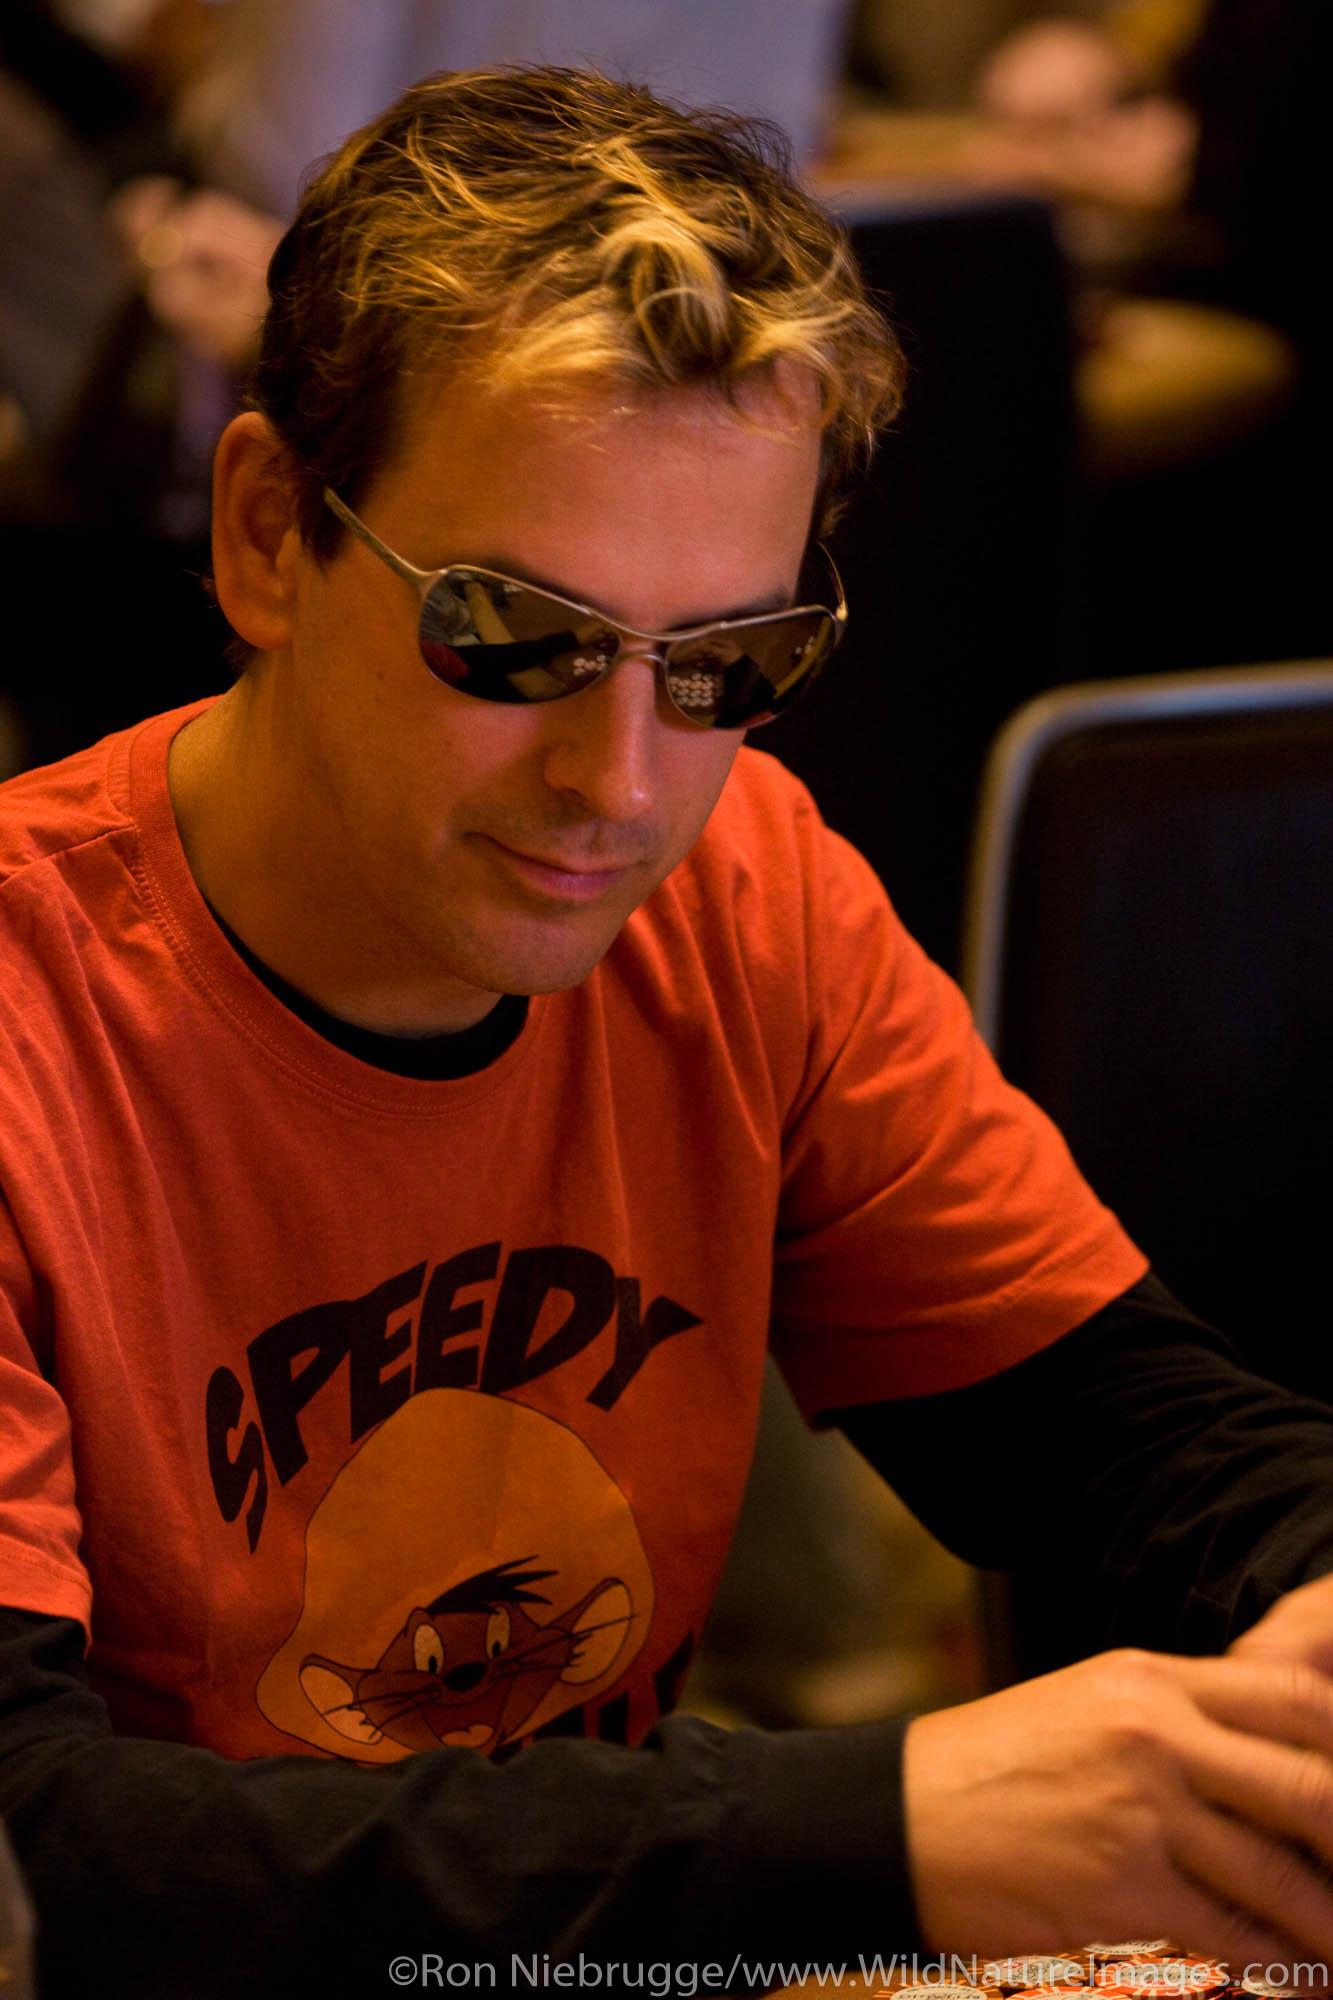 Phil Laak at the 2008 World Poker Tour Festa Al Lago poker tournament at the Bellagio Resort and Casino, Las Vegas, Nevada.